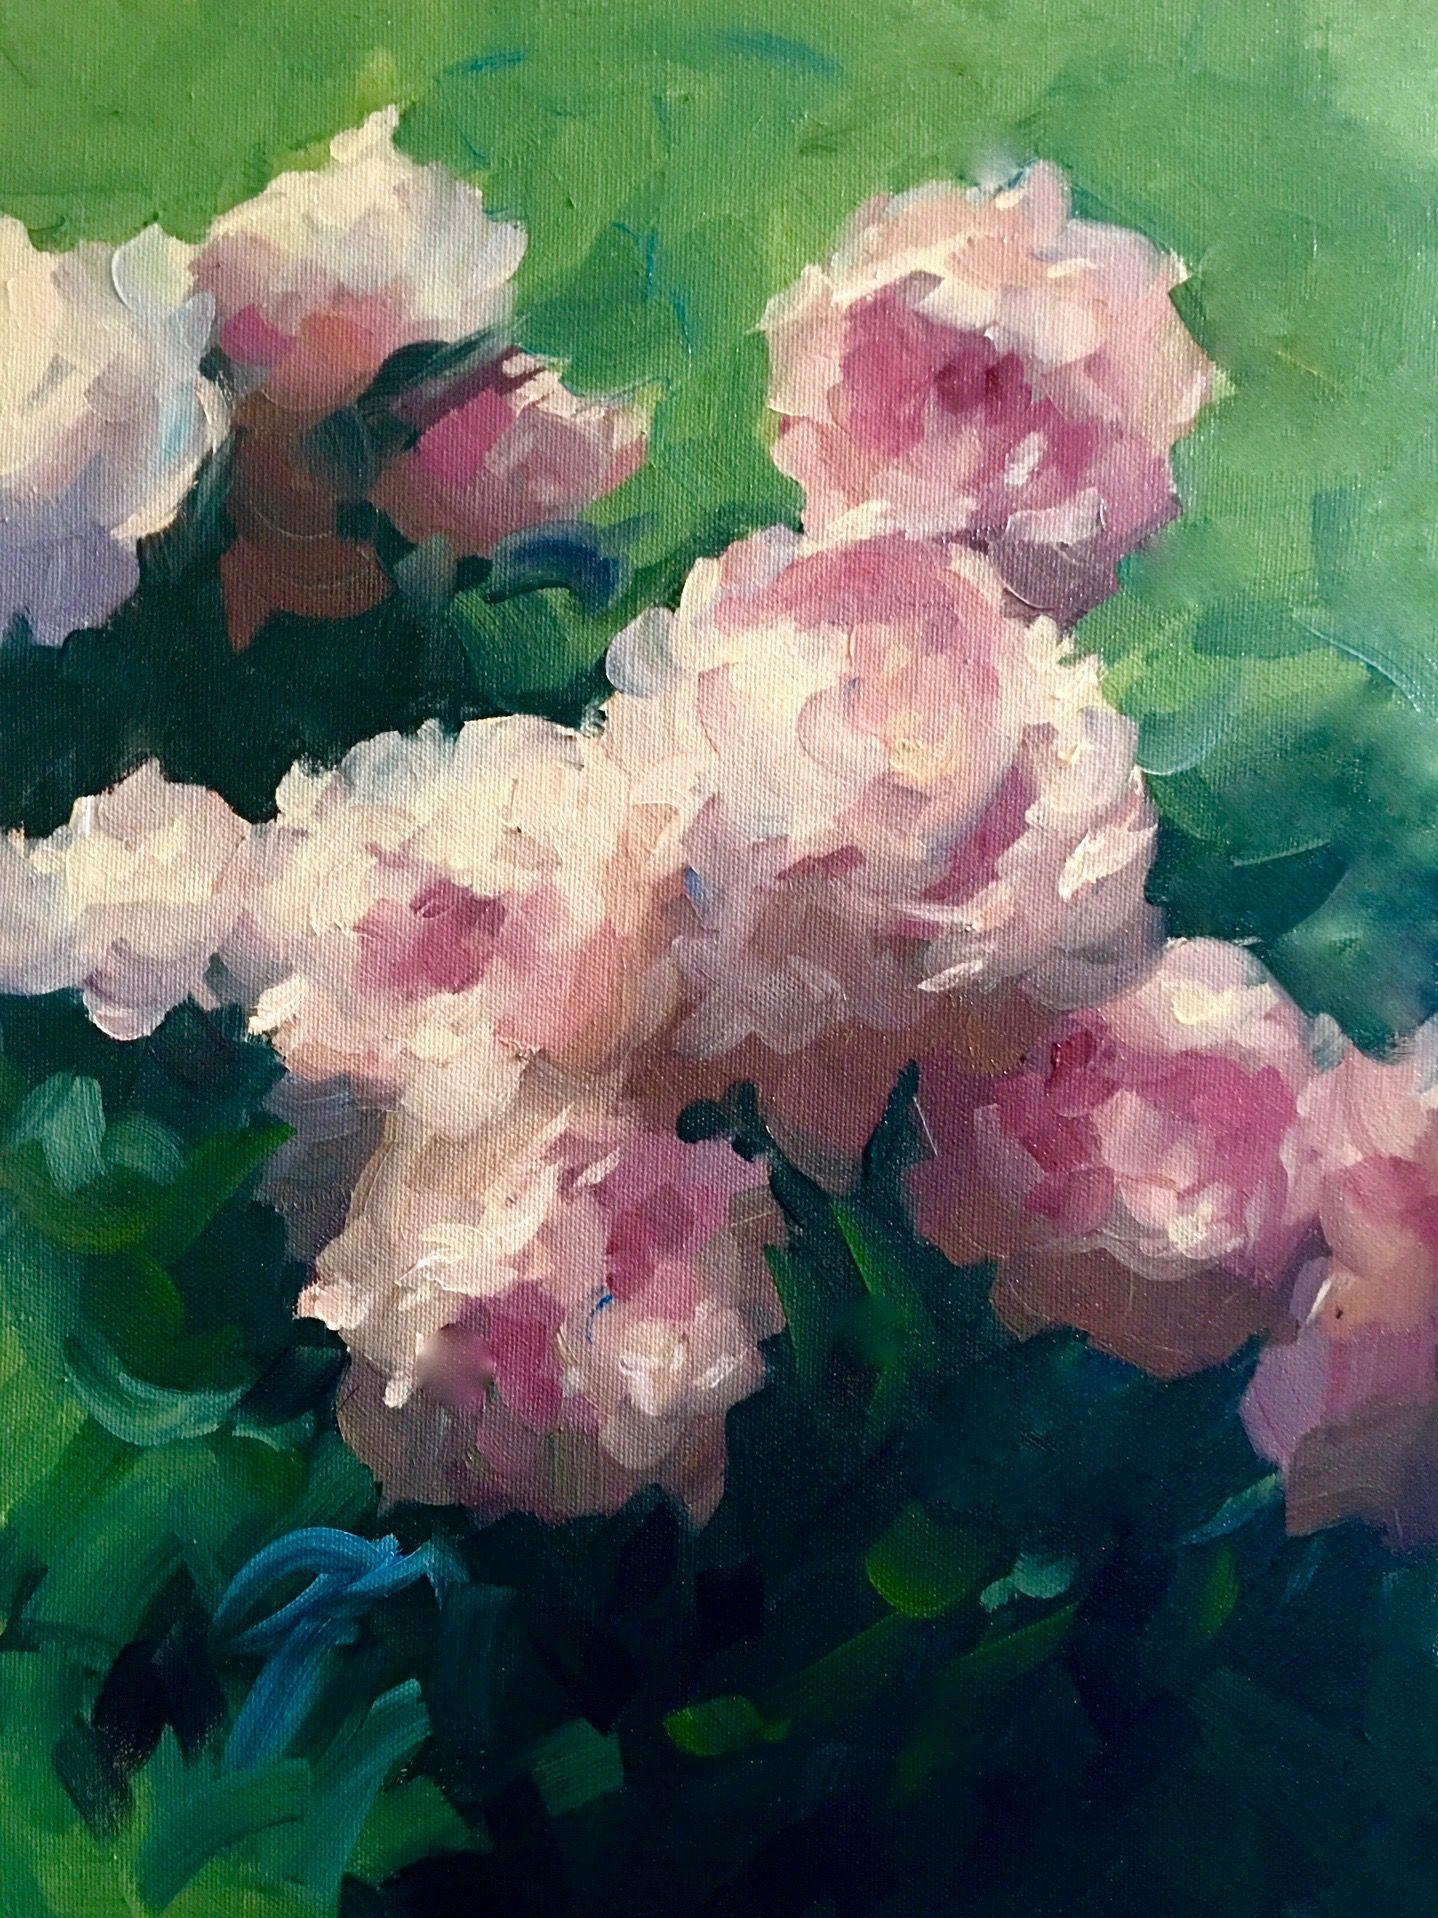 """Sarah Bernhardt"" oil on canvas 16"" x 12"""